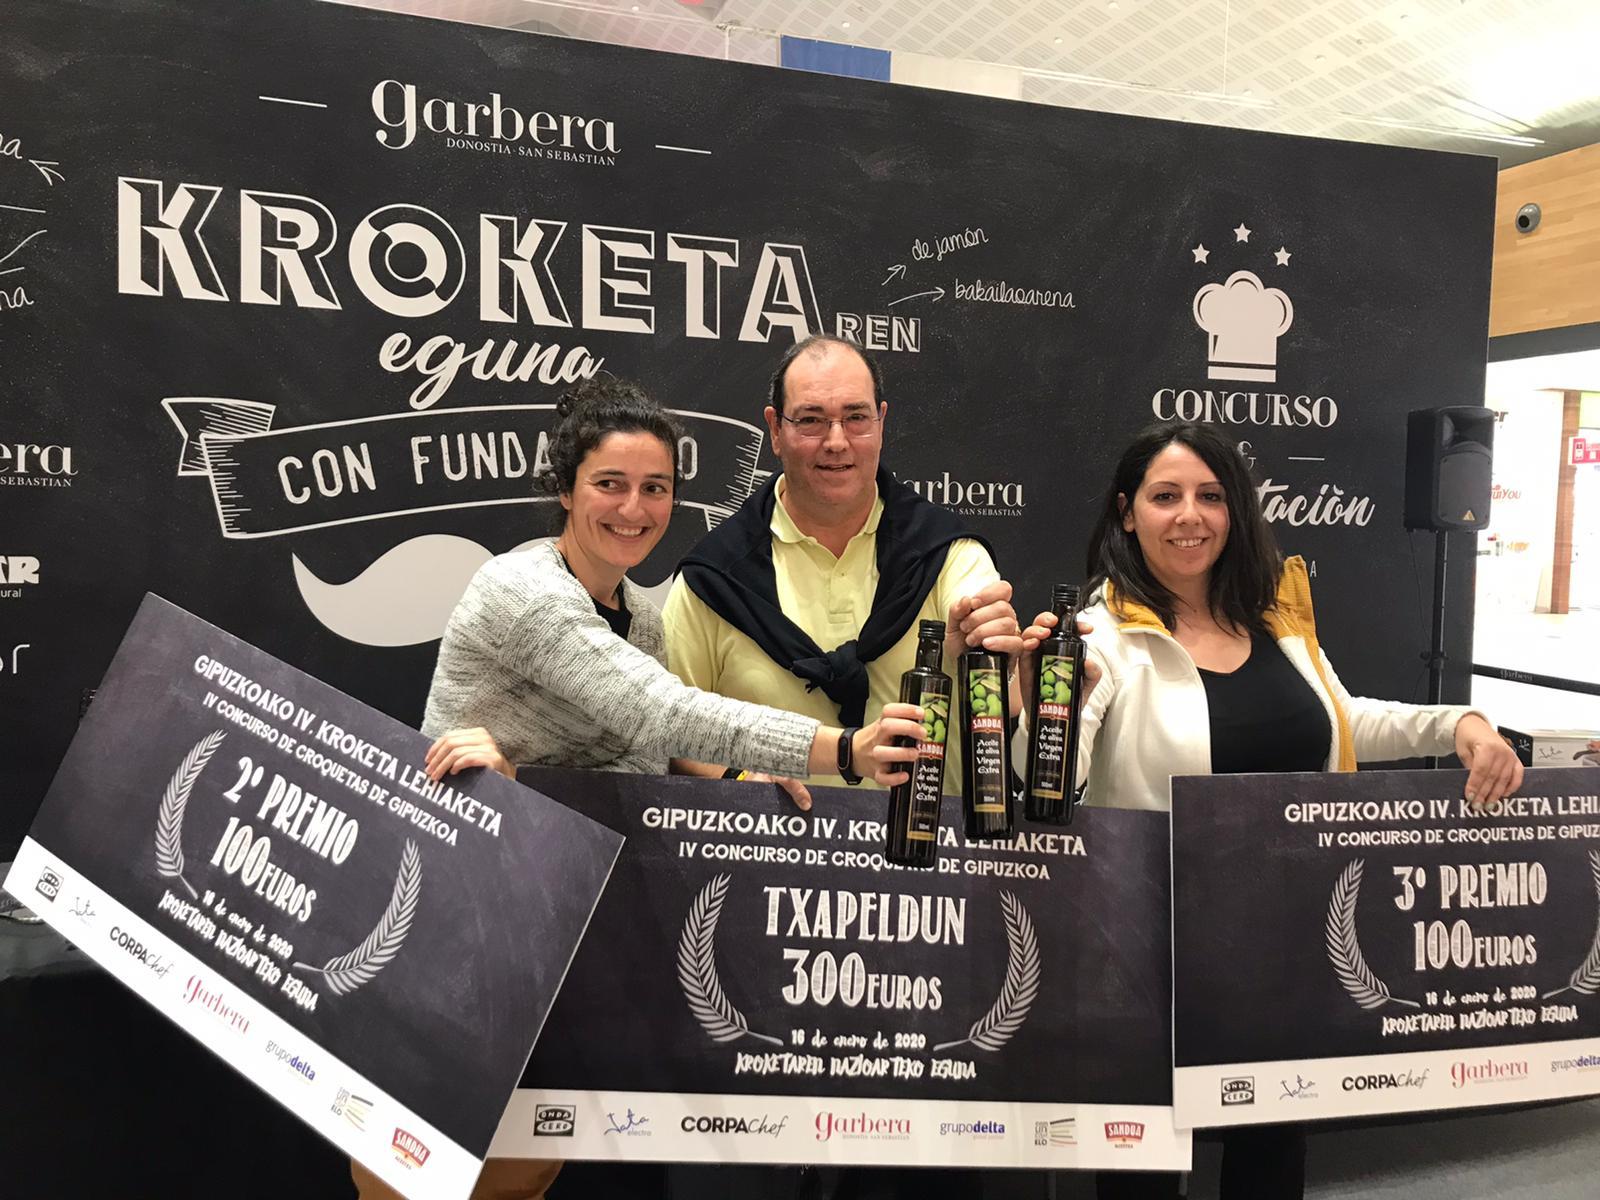 IV Concurso Croquetas